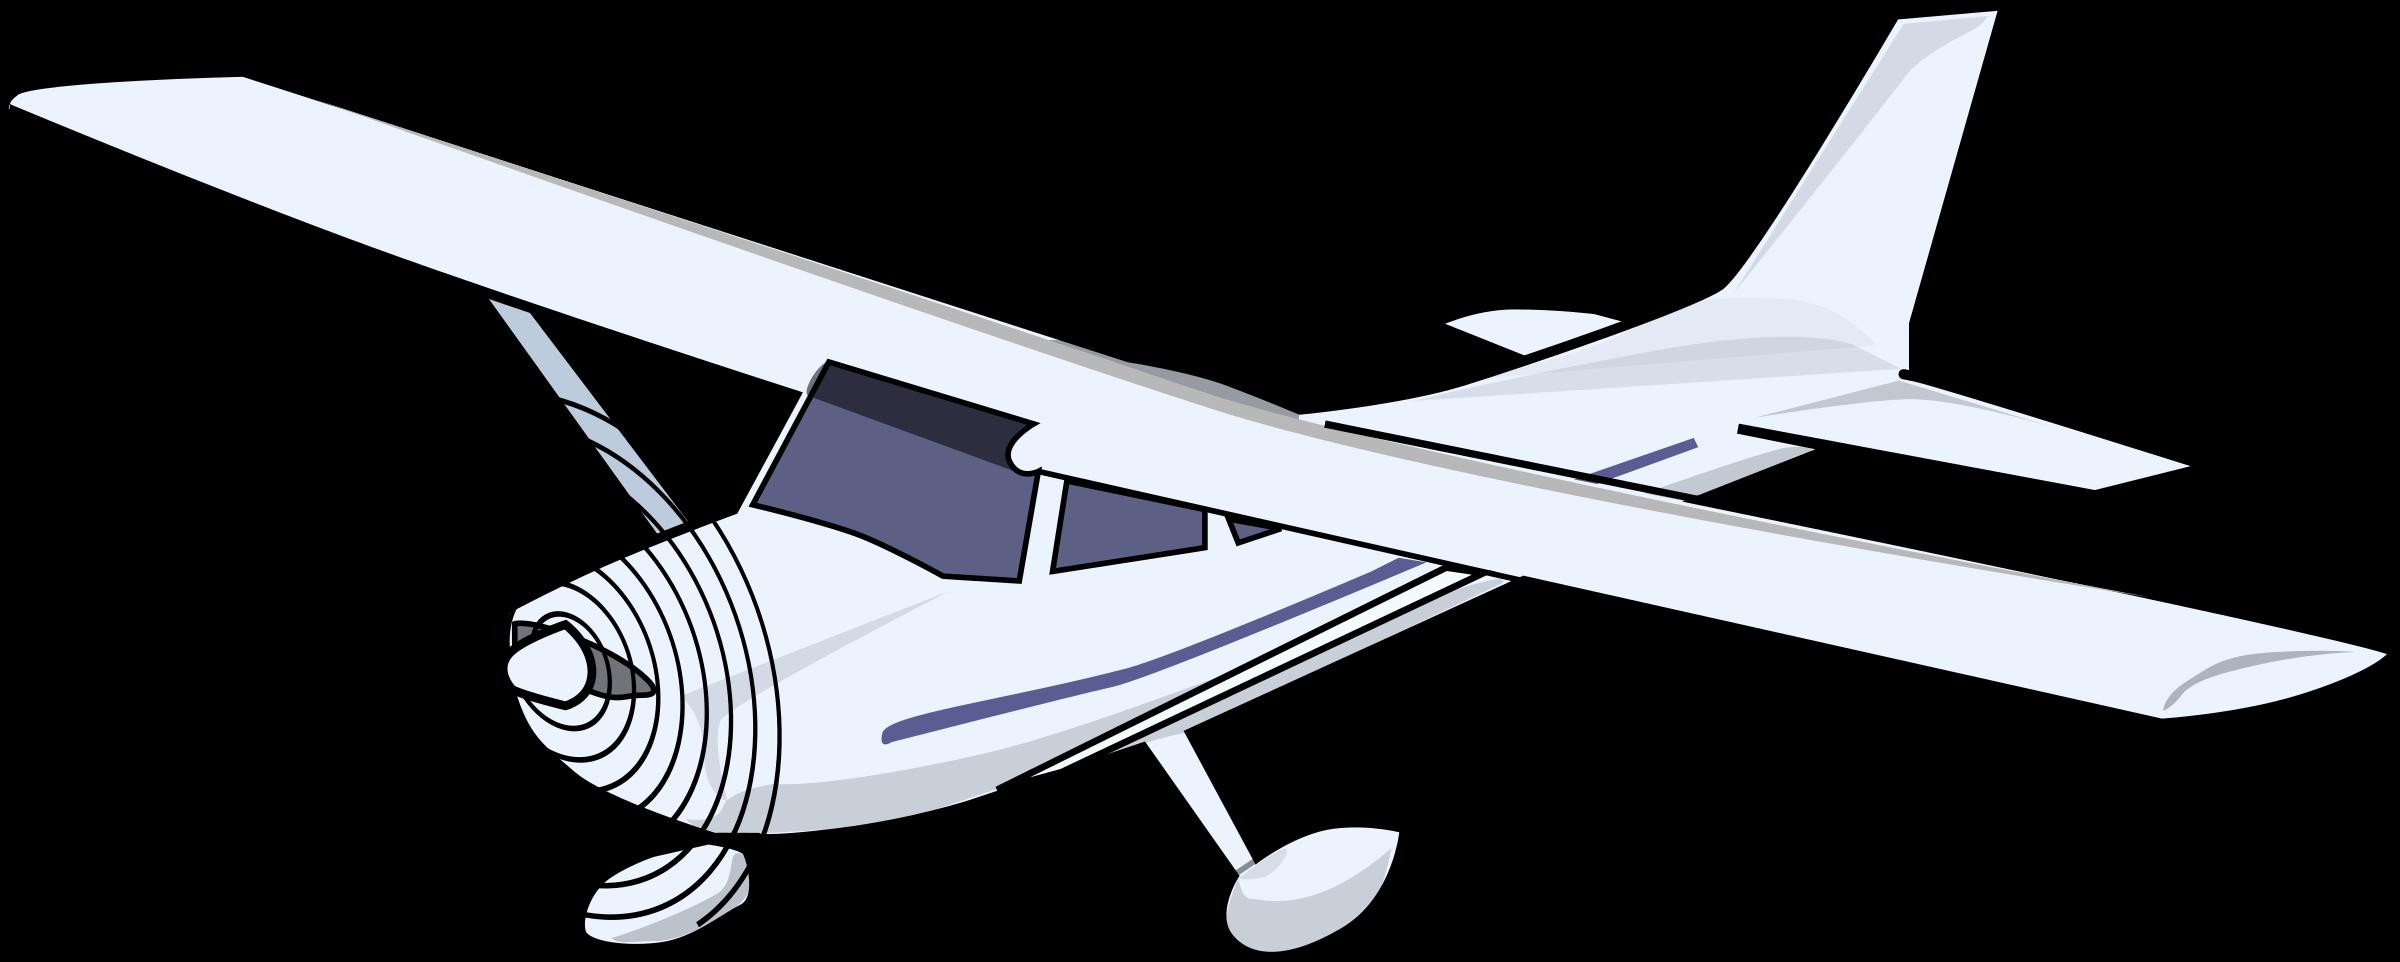 Airplane Cessna 172 Cessna 150 Clip art.